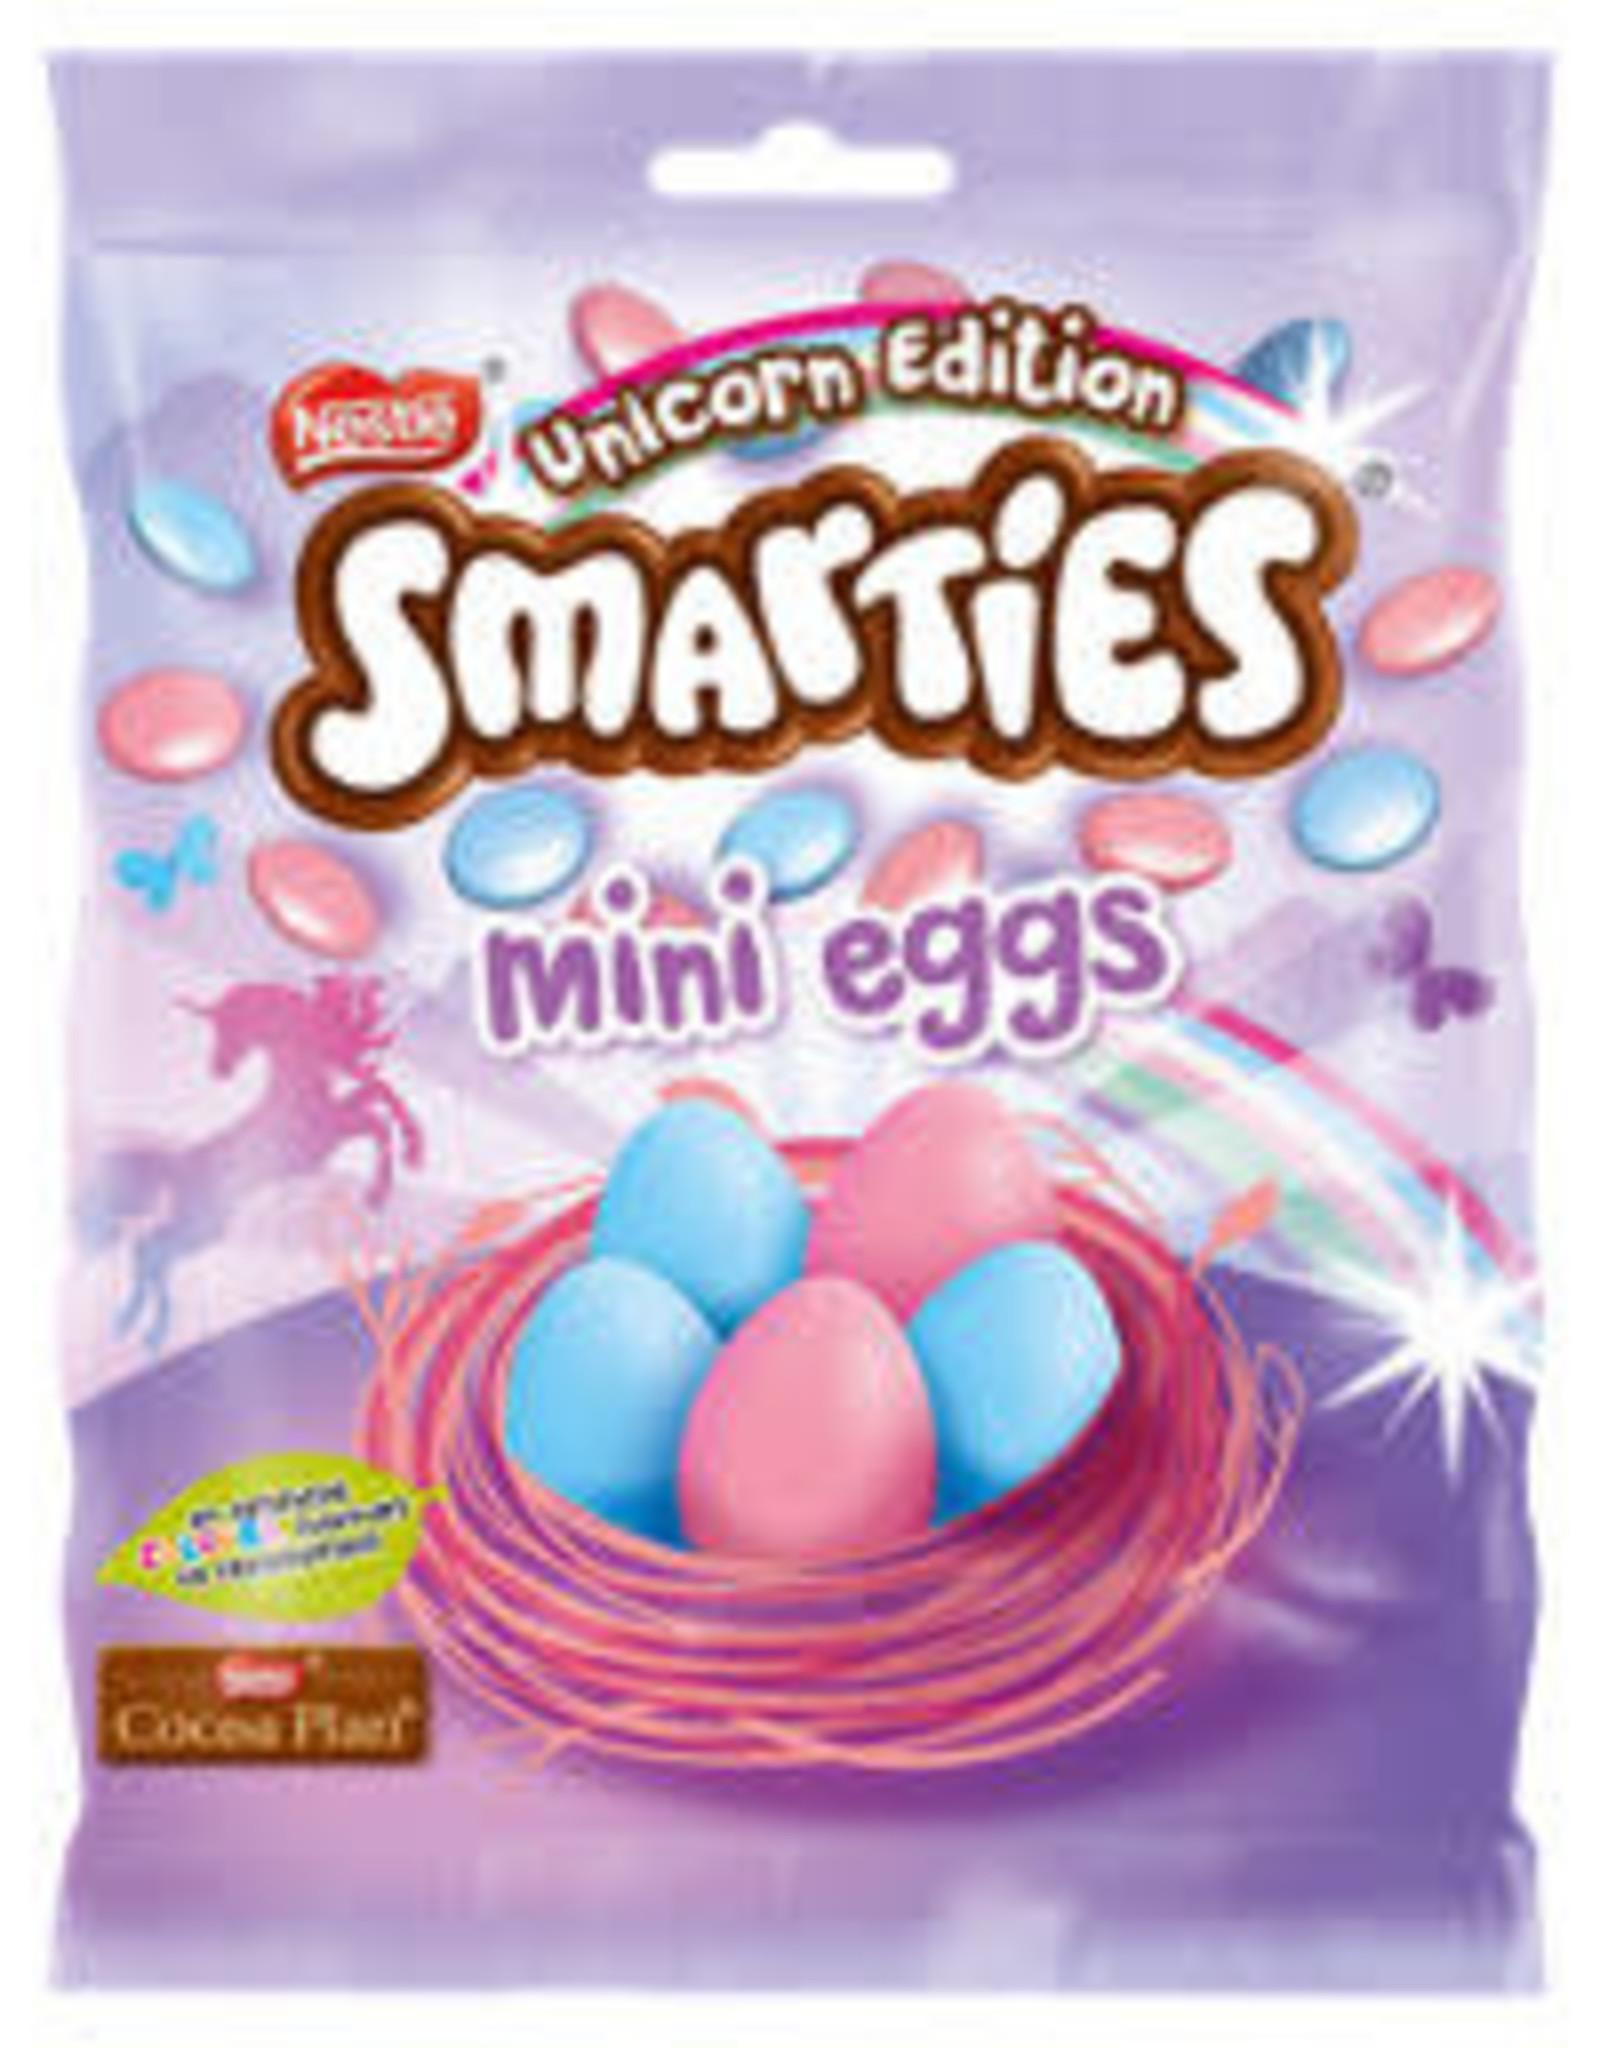 Smarties Smarties Mini Eggs Unicorn Edition 80g